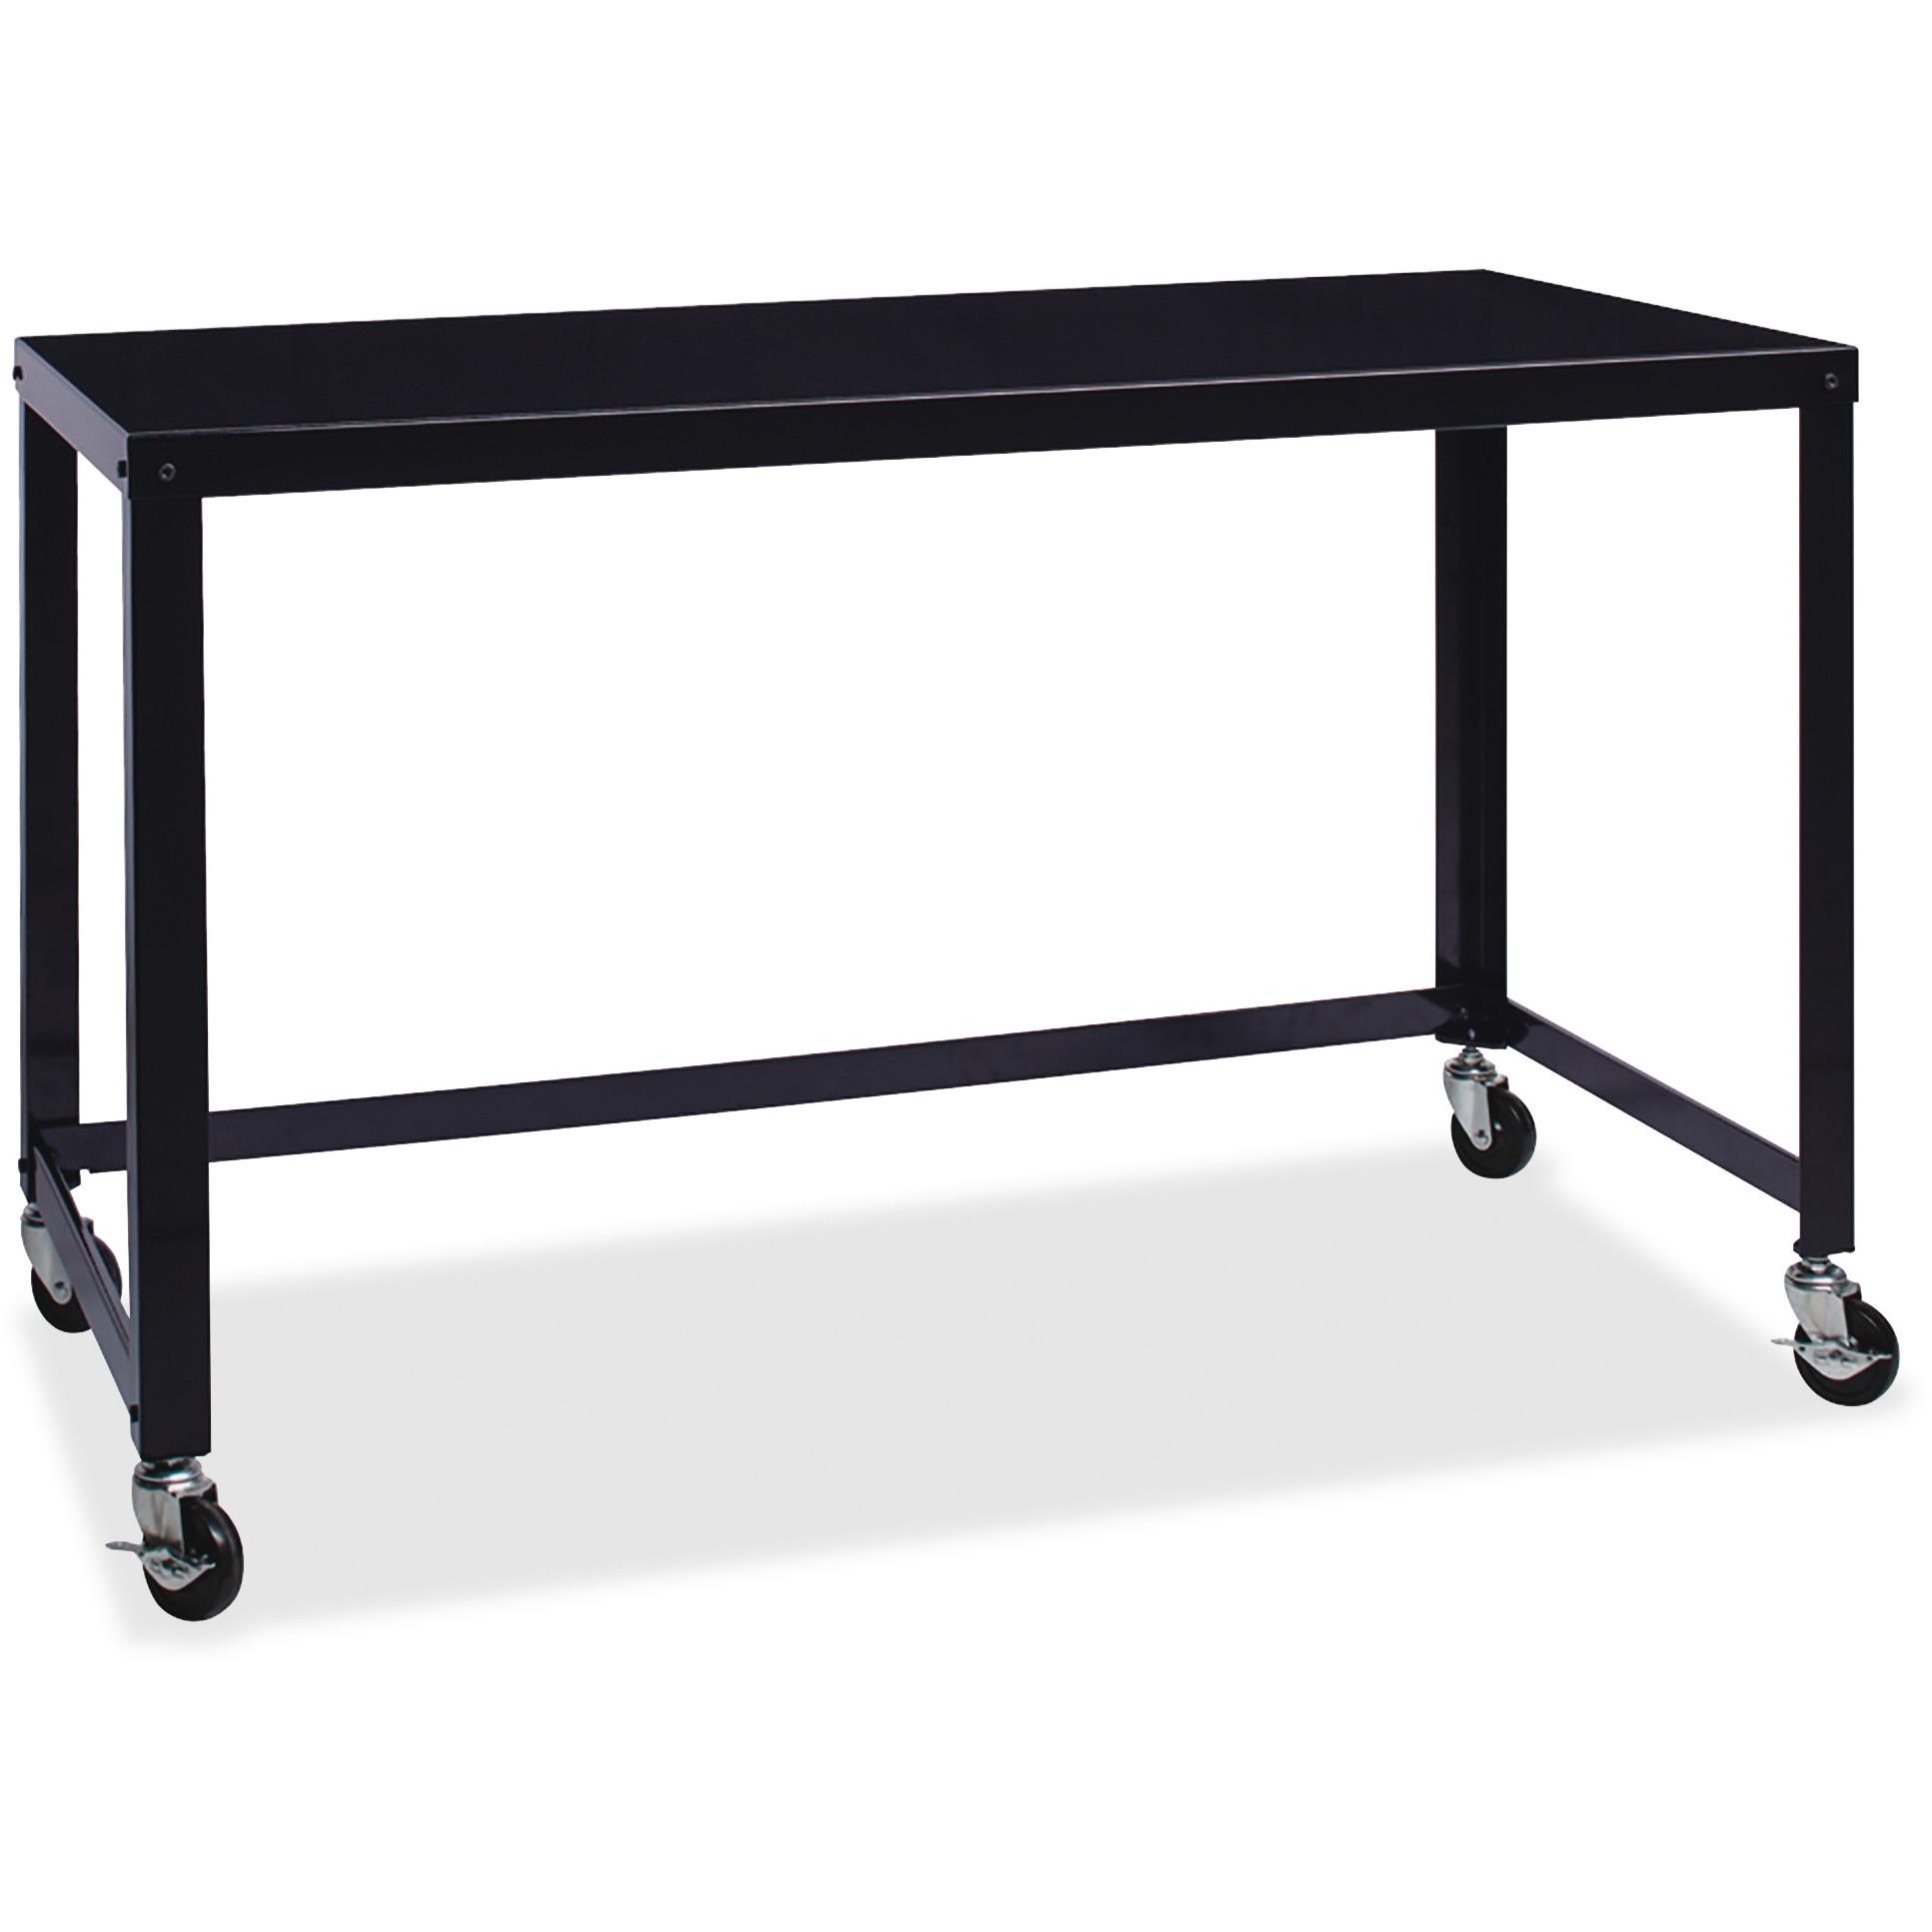 Lorell, LLR34417, Personal Mobile Desk, 1 Each